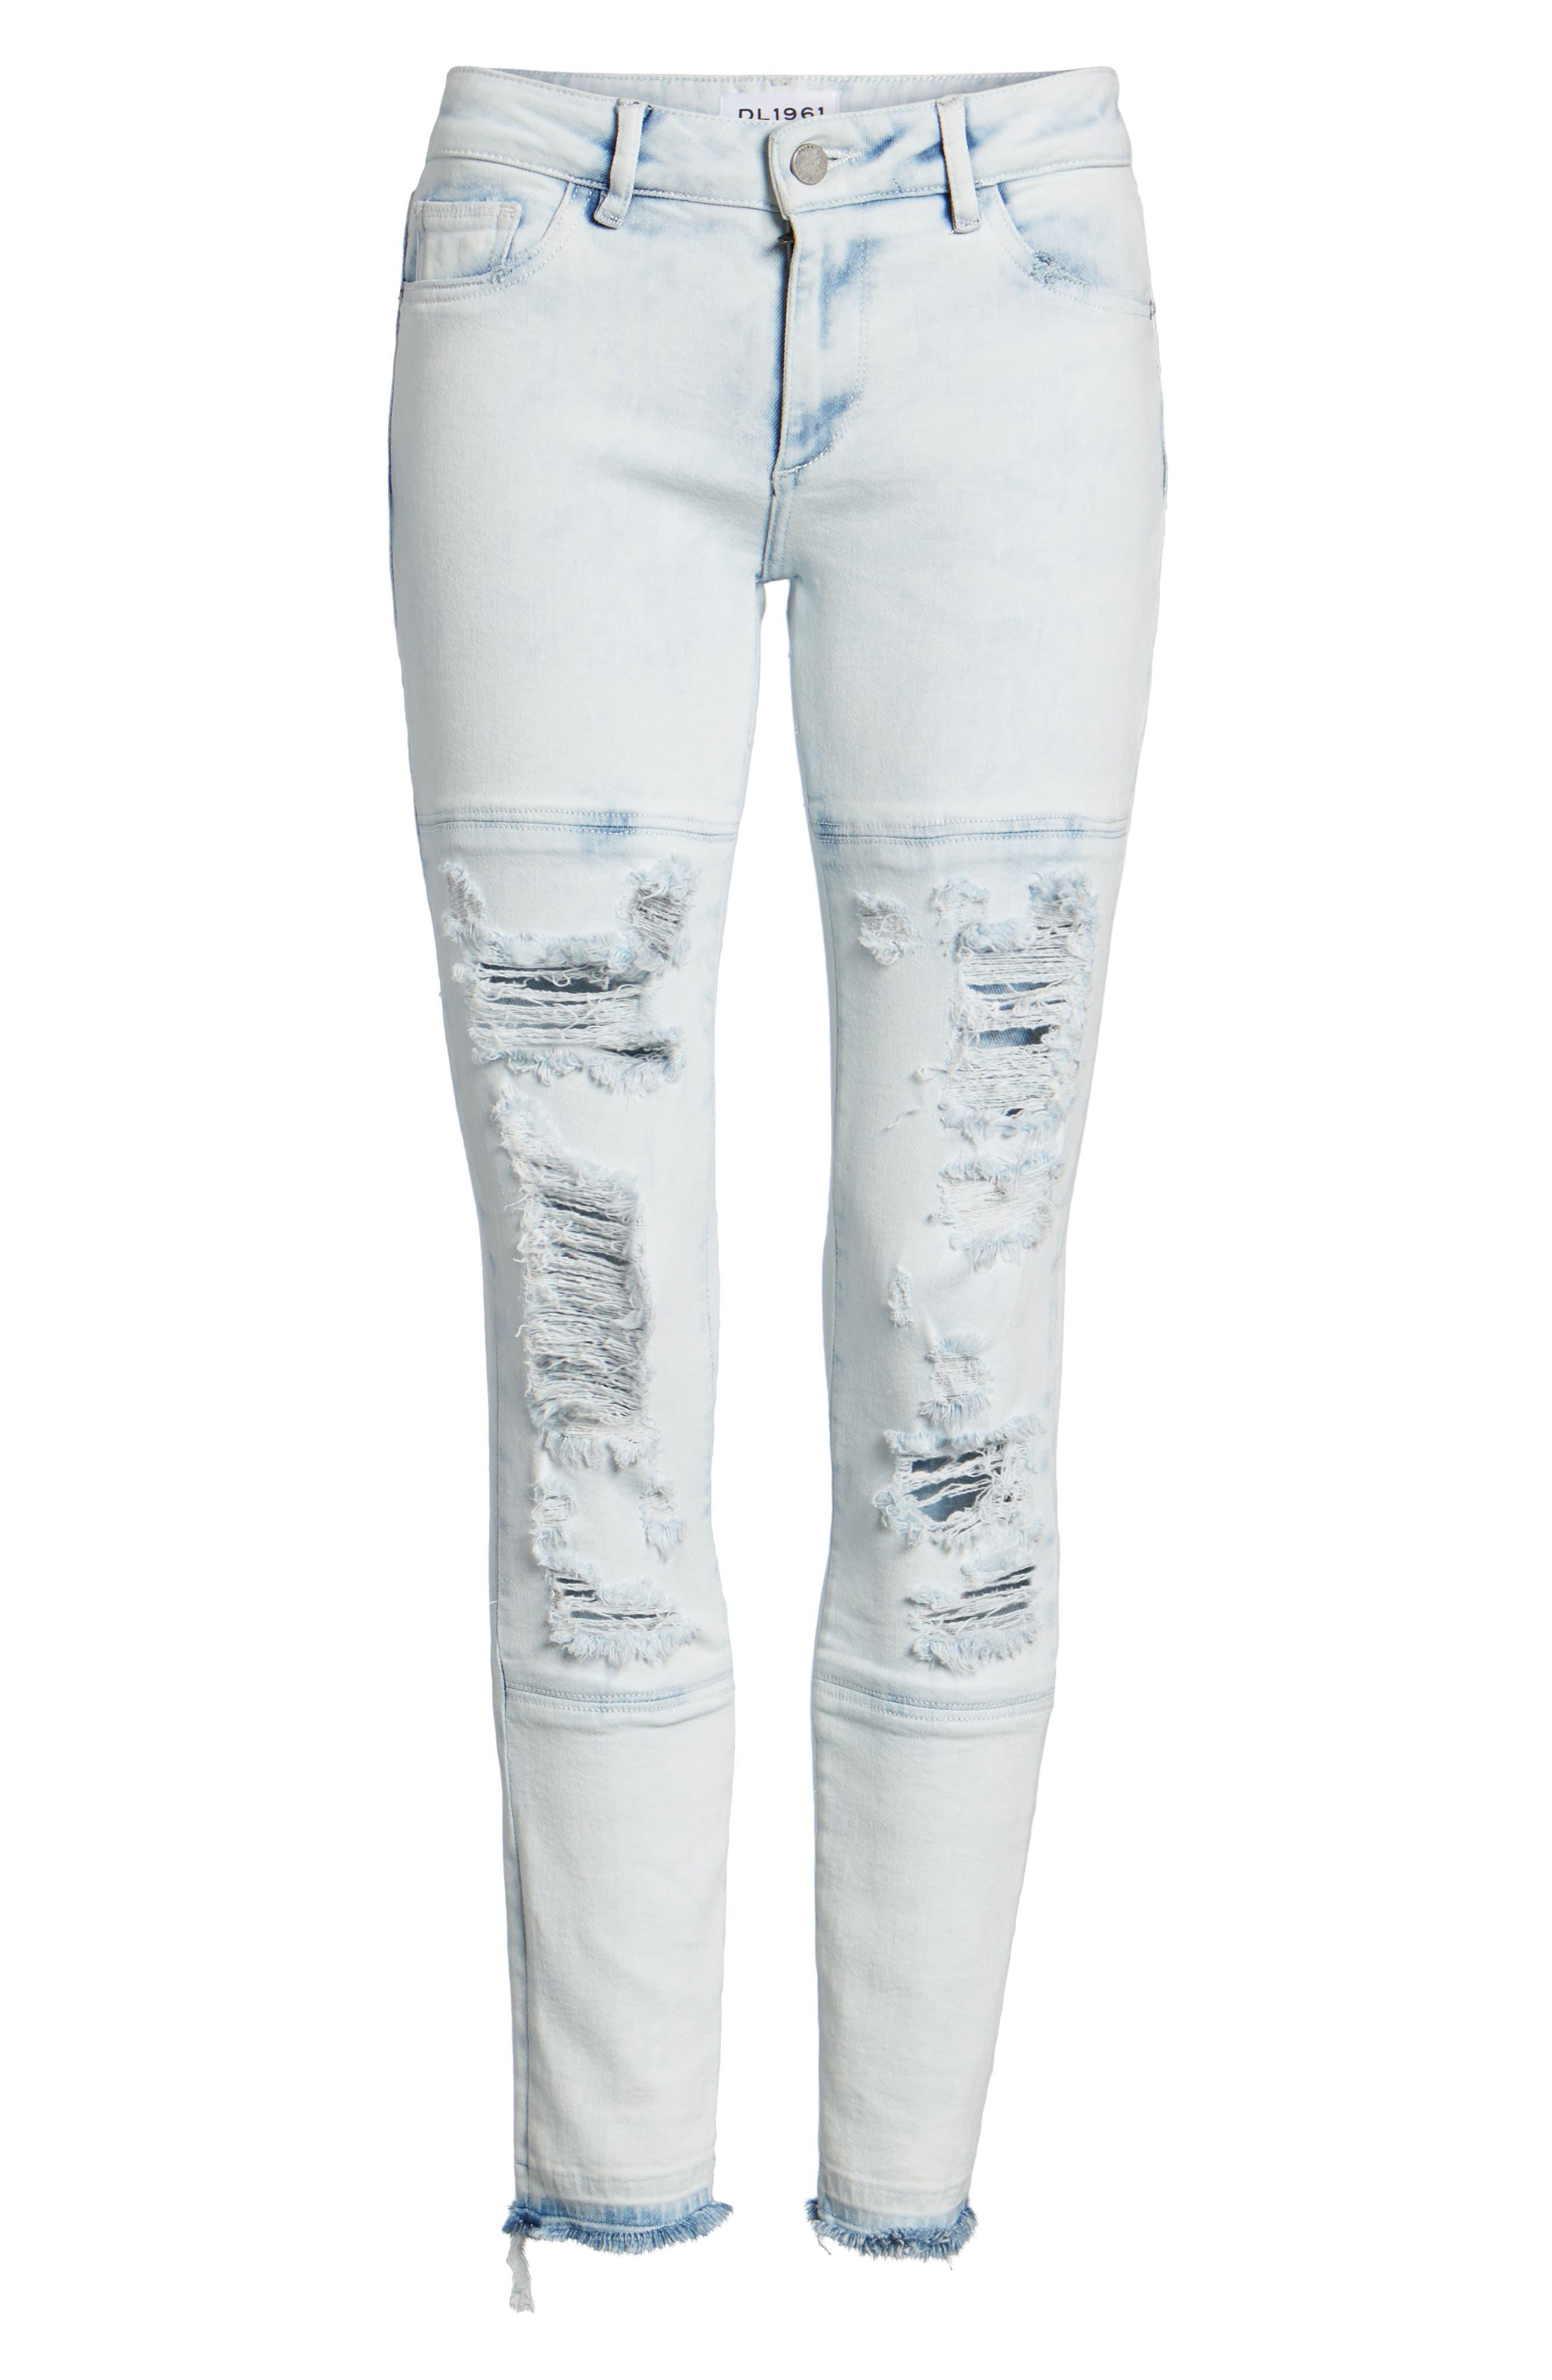 Emma Power Legging Ripped Skinny Jeans,                             Alternate thumbnail 7, color,                             020